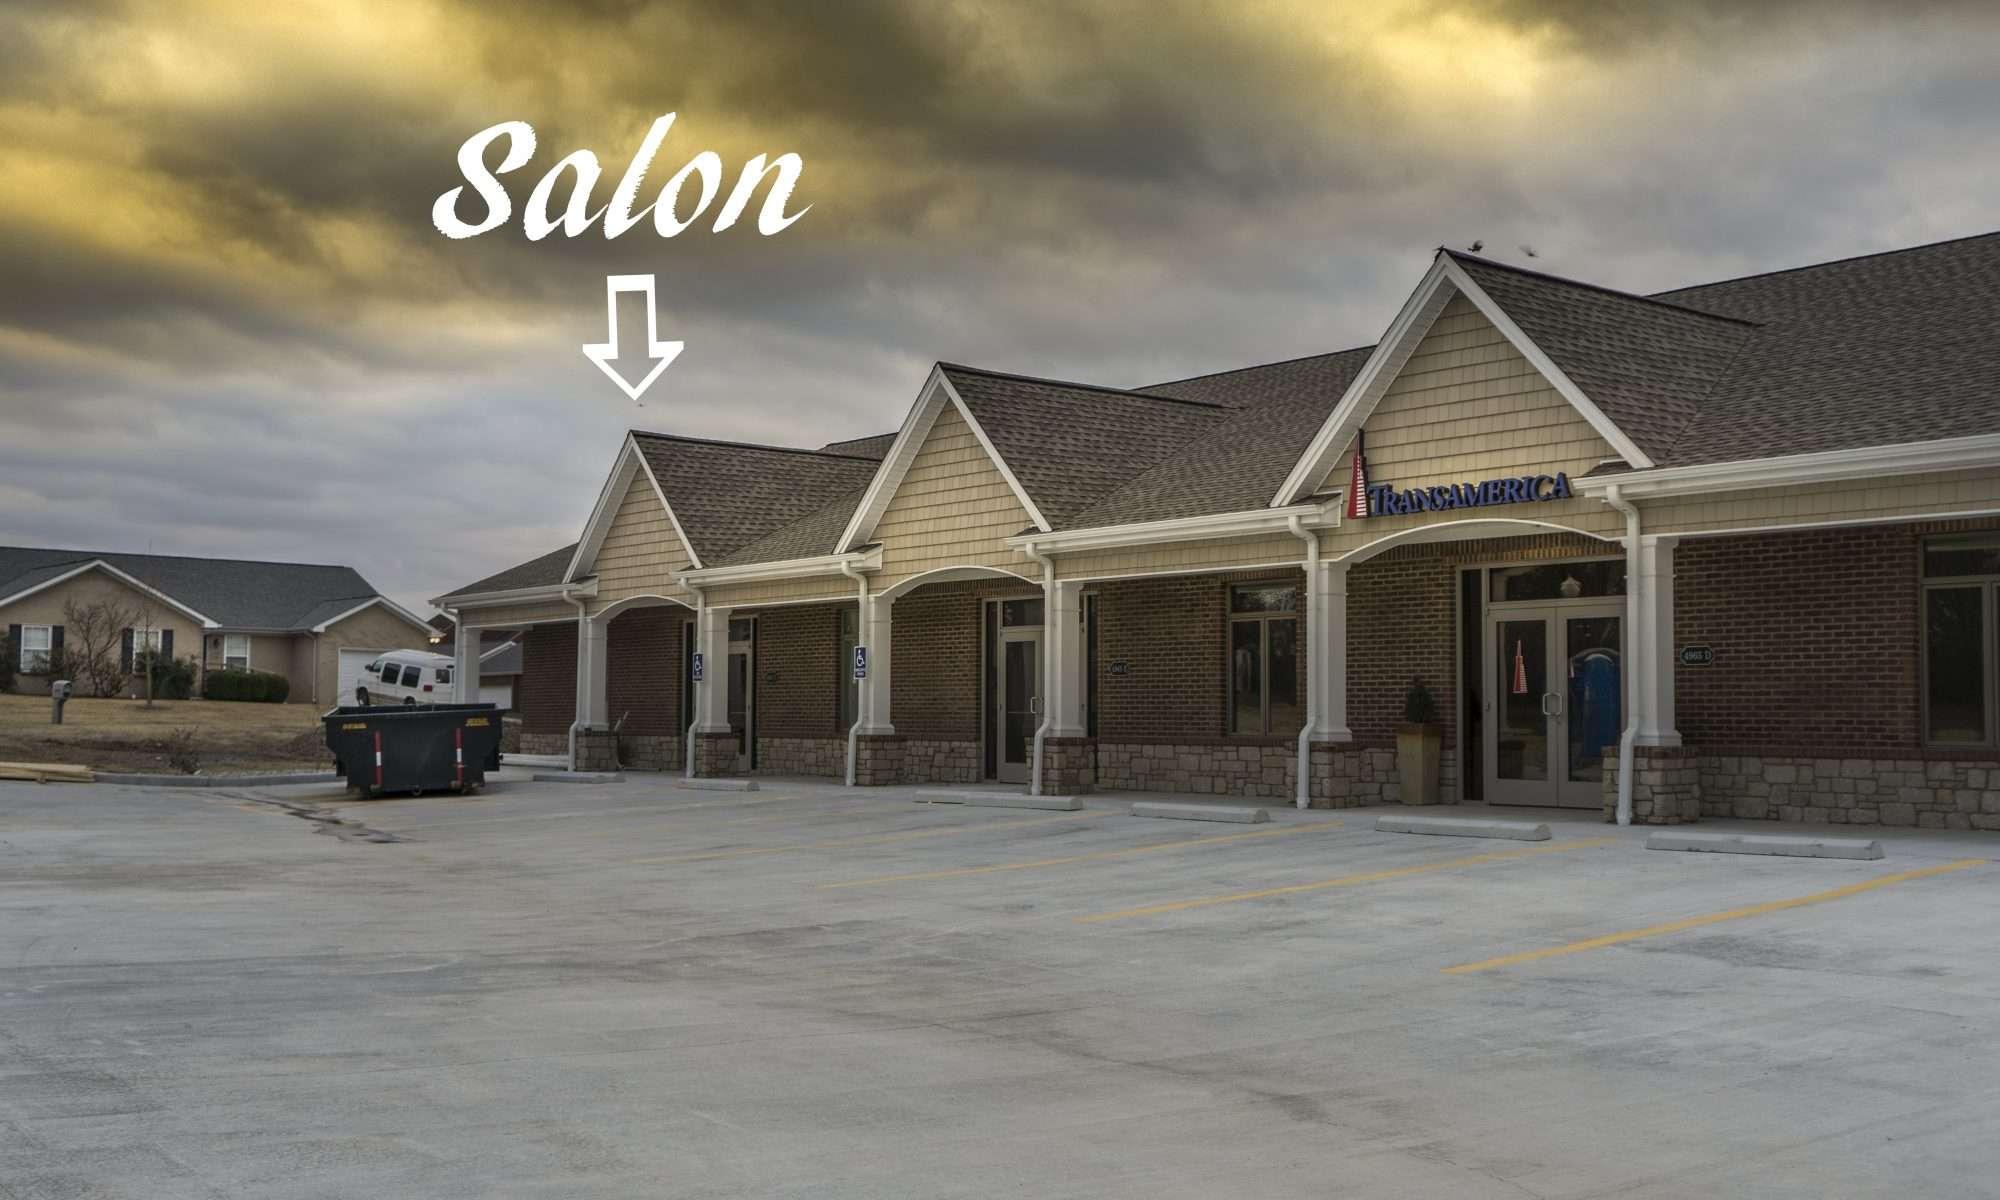 Jan 23, 2018 - Damron Salon and Spa4965 Village Square Dr Paducah, KY/photonews247.com